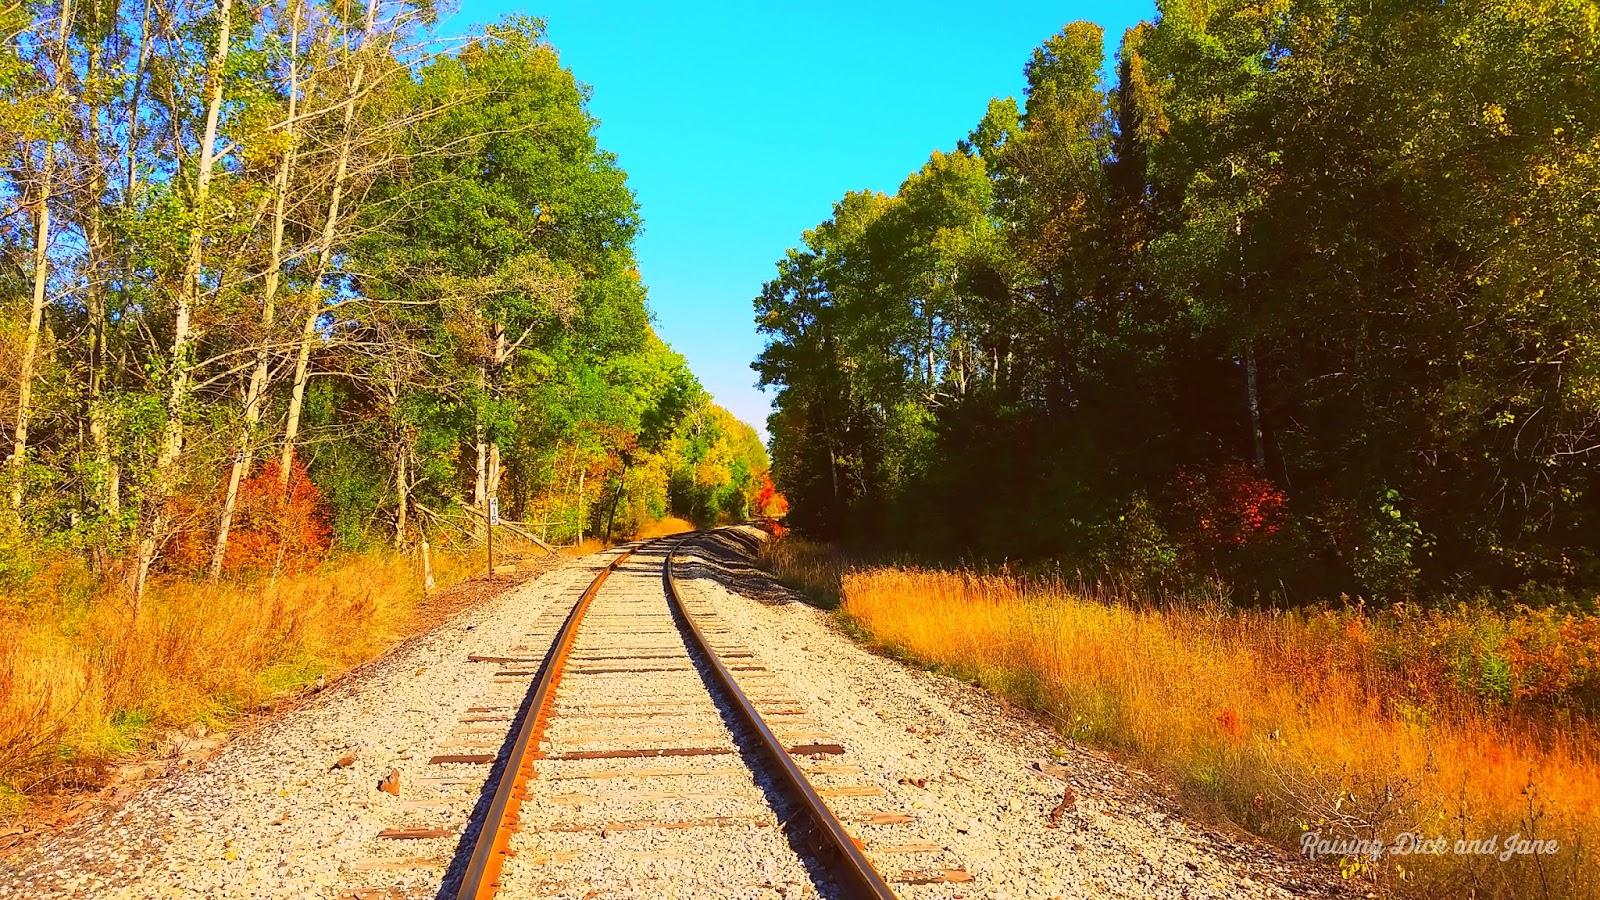 Railroad photo in Boyne Falls, MI